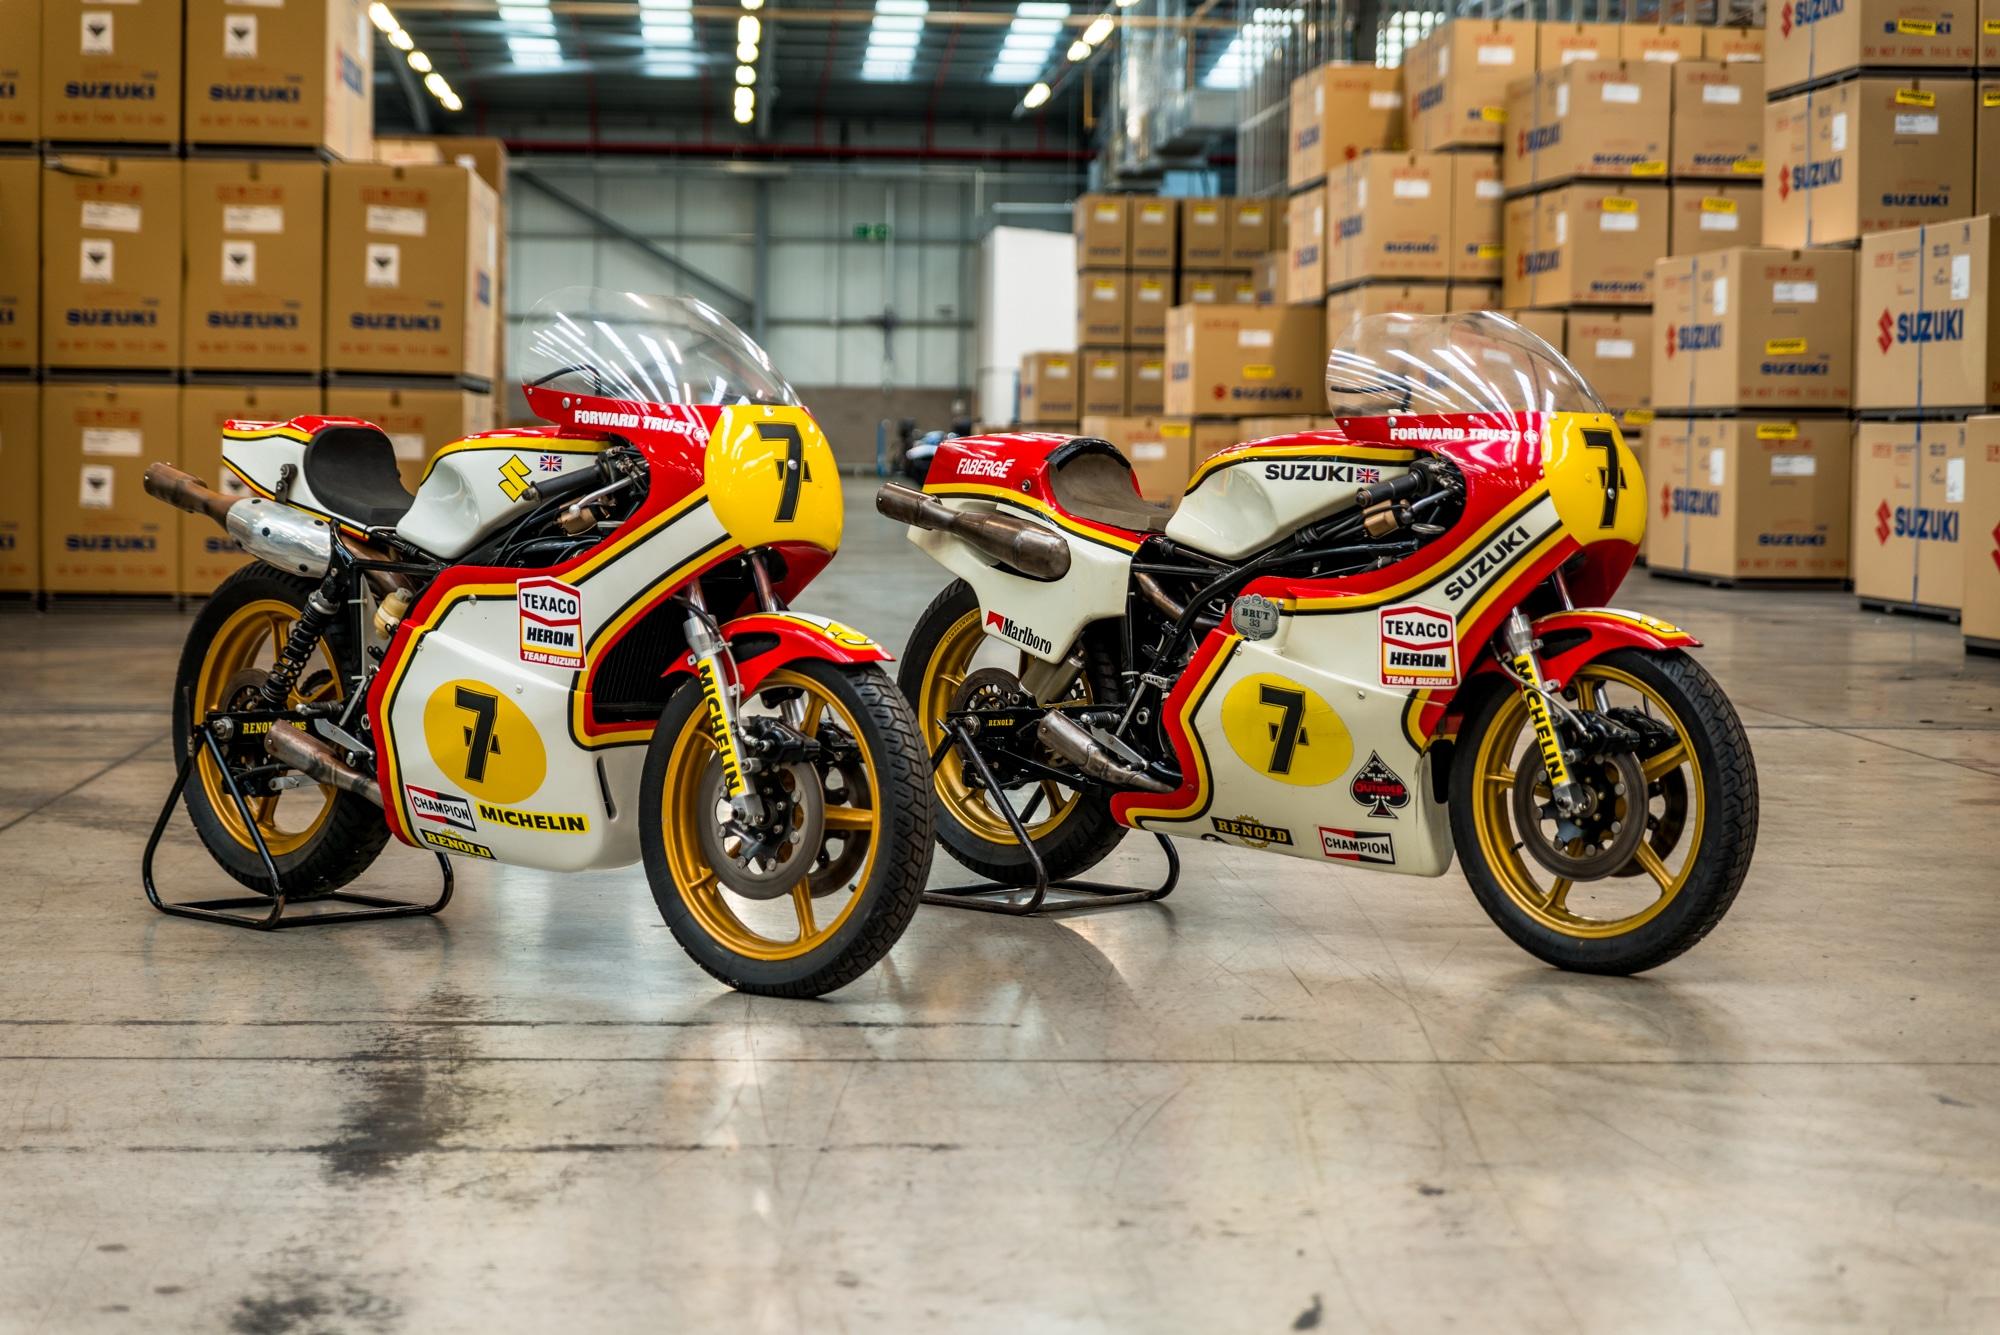 Team Classic Suzuki - two vintage bikes